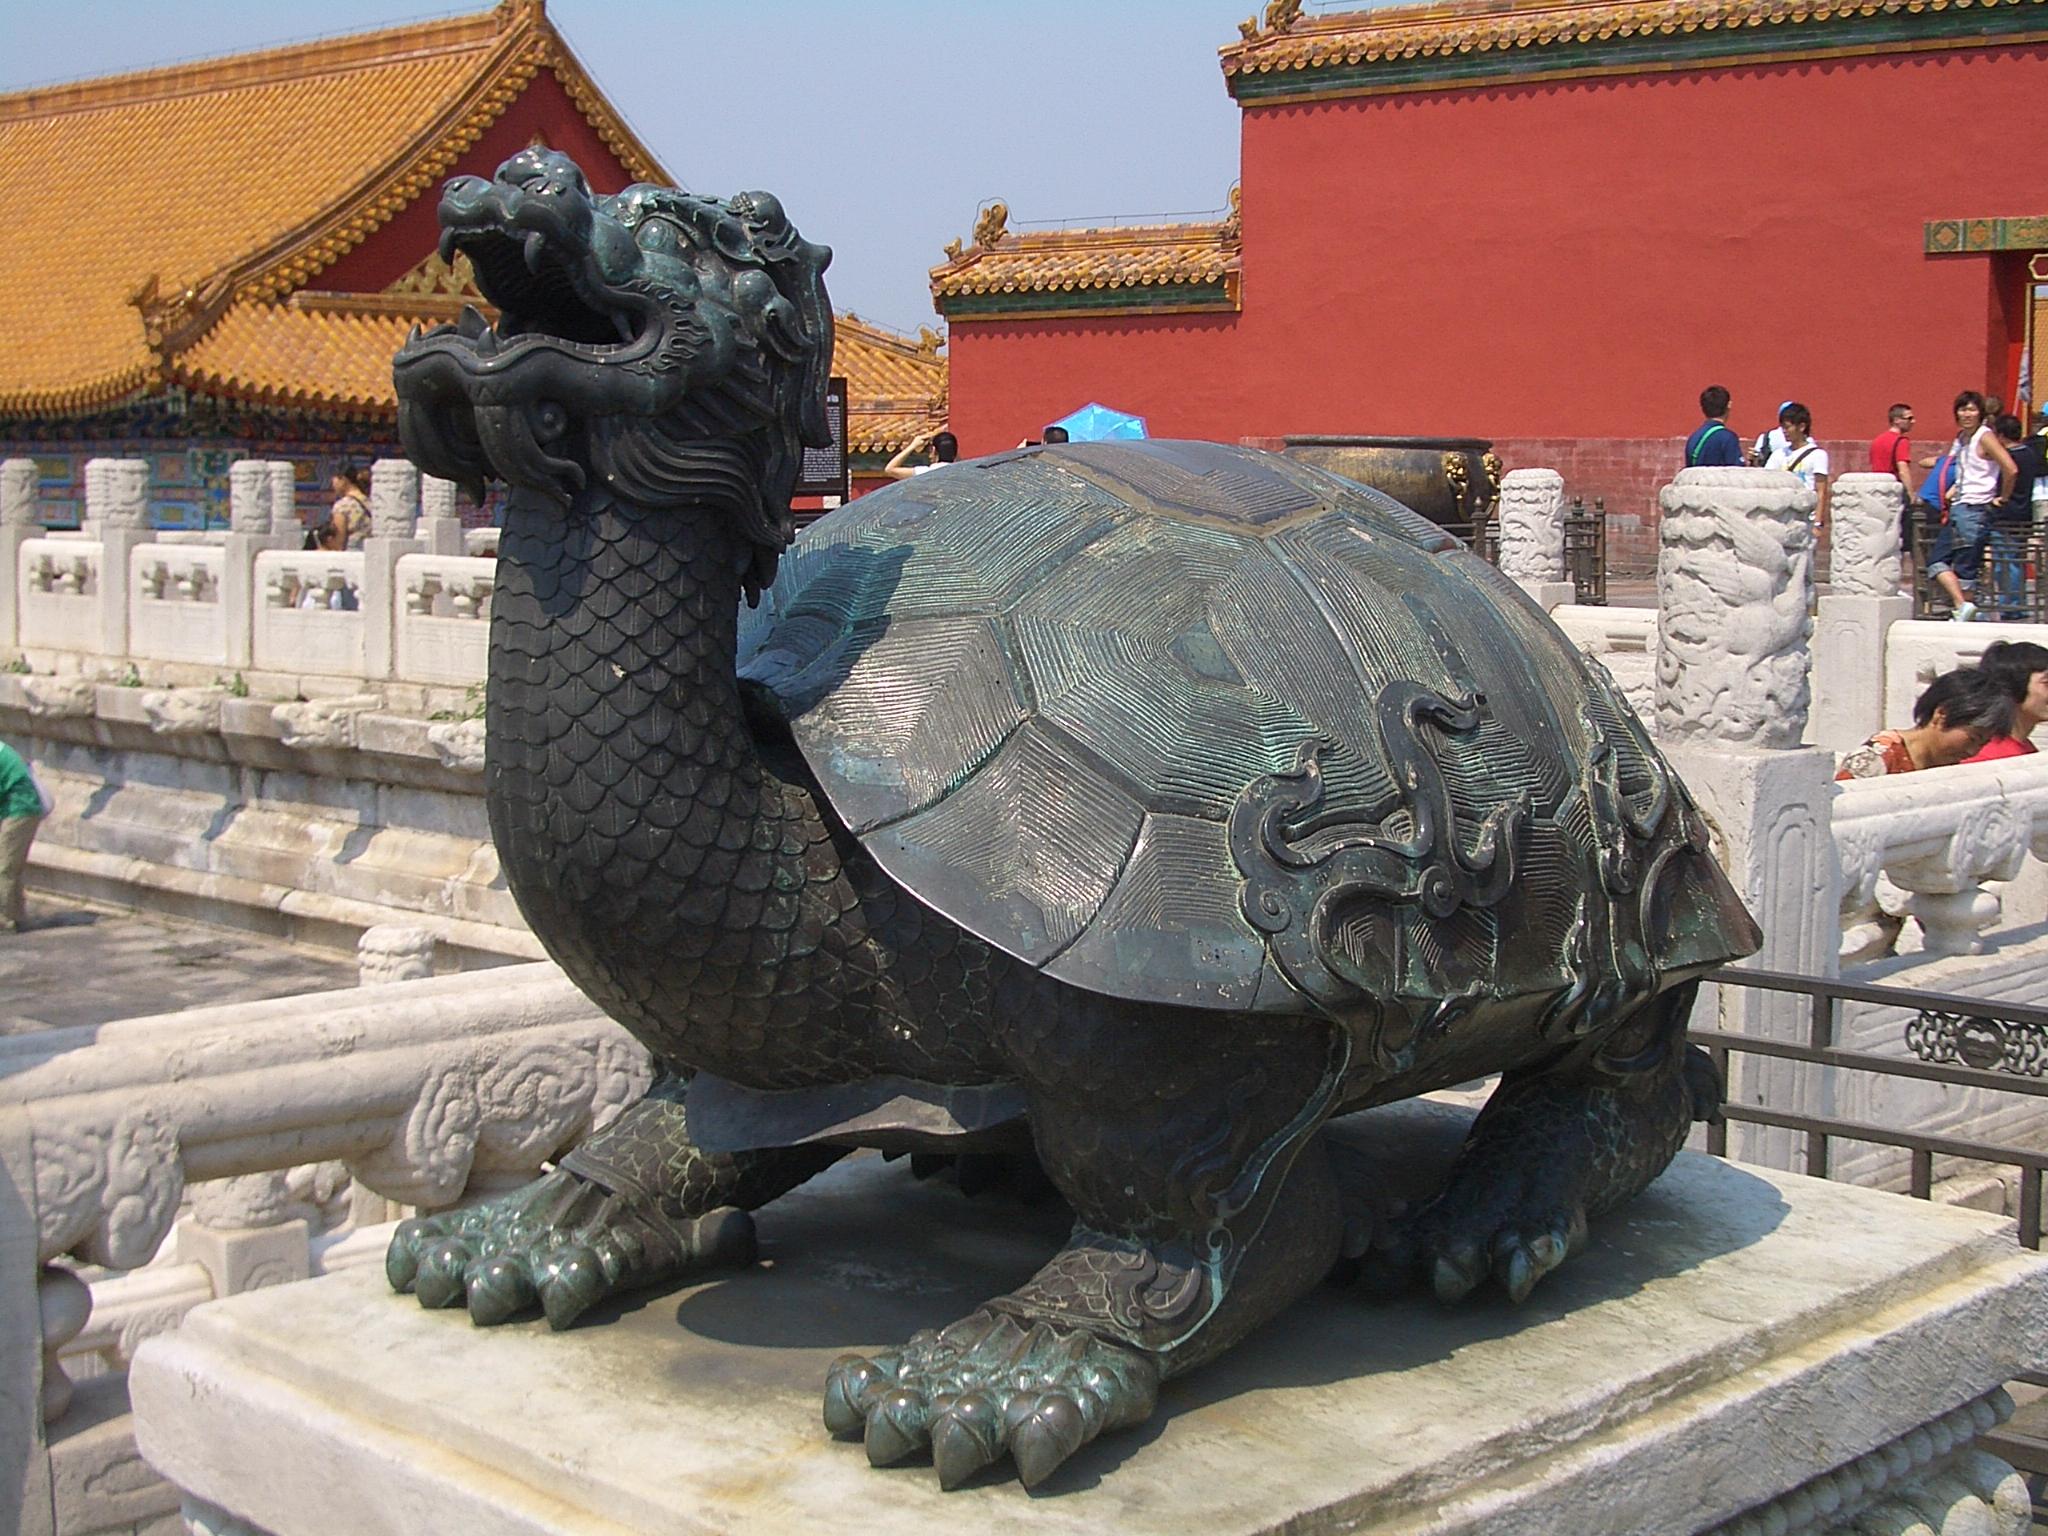 A tortoise statue in the Forbidden City, Beijing.